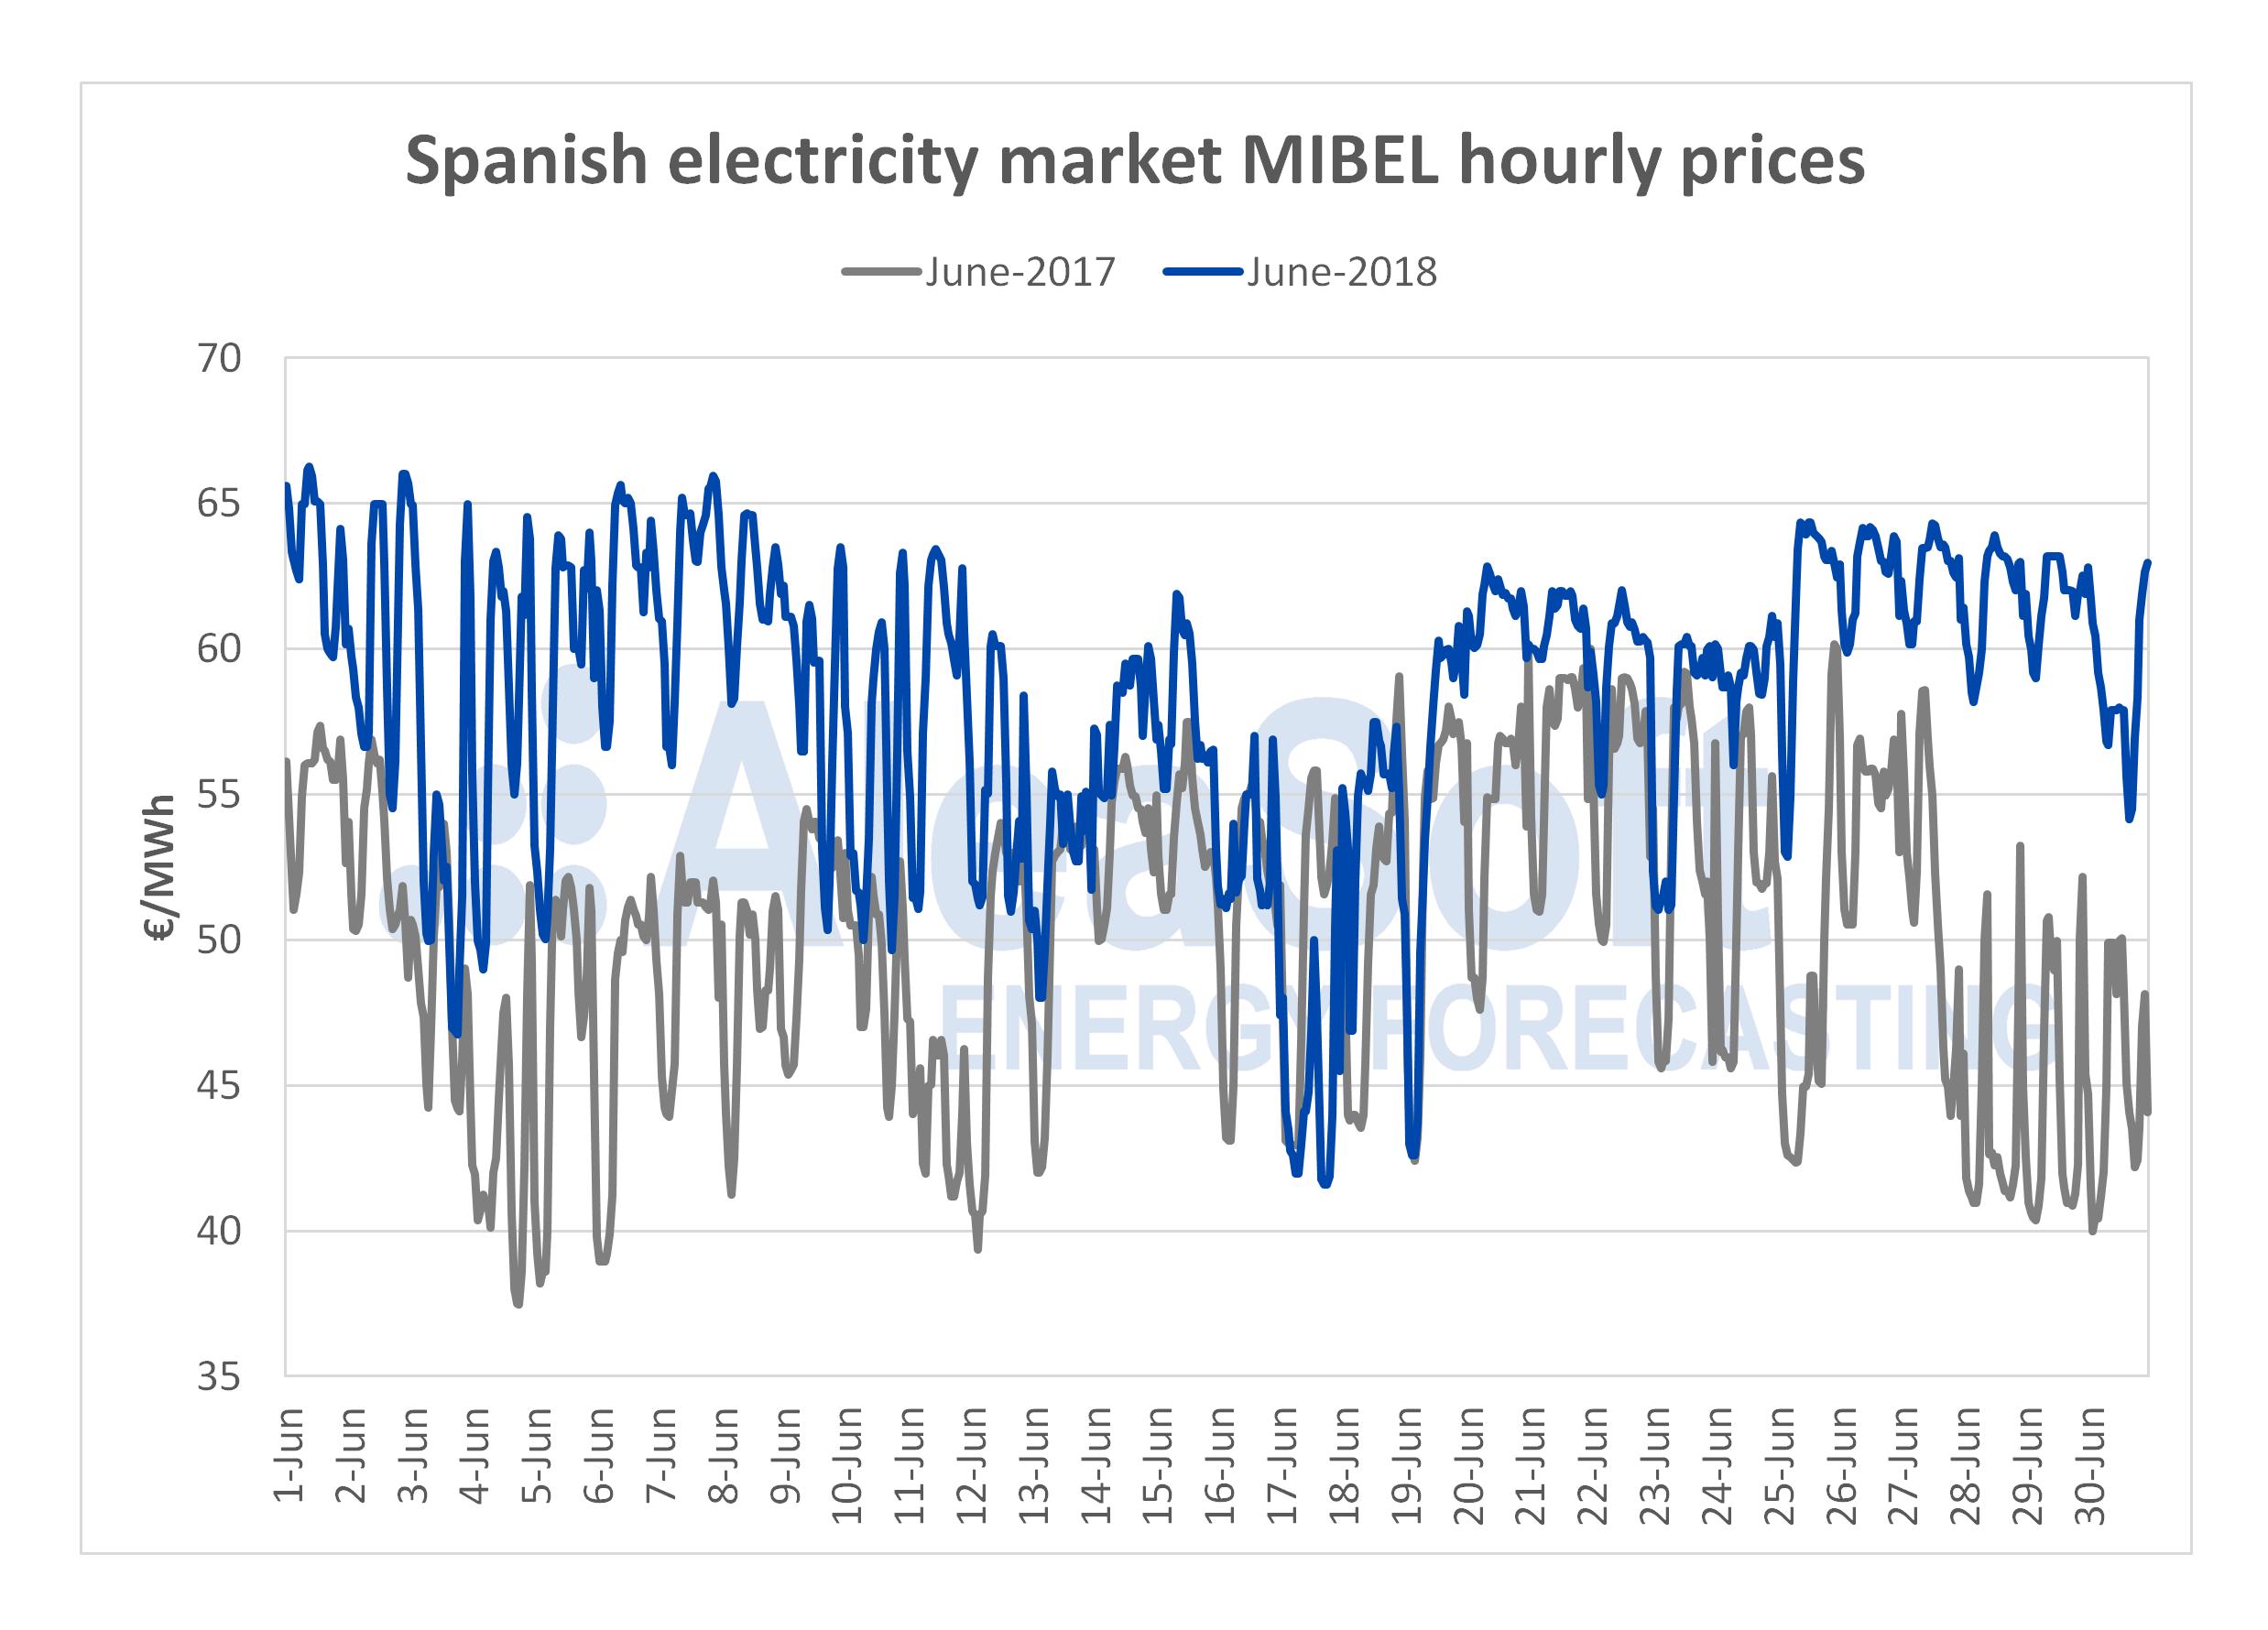 AleaSoft - MIBEL hourly electricity price